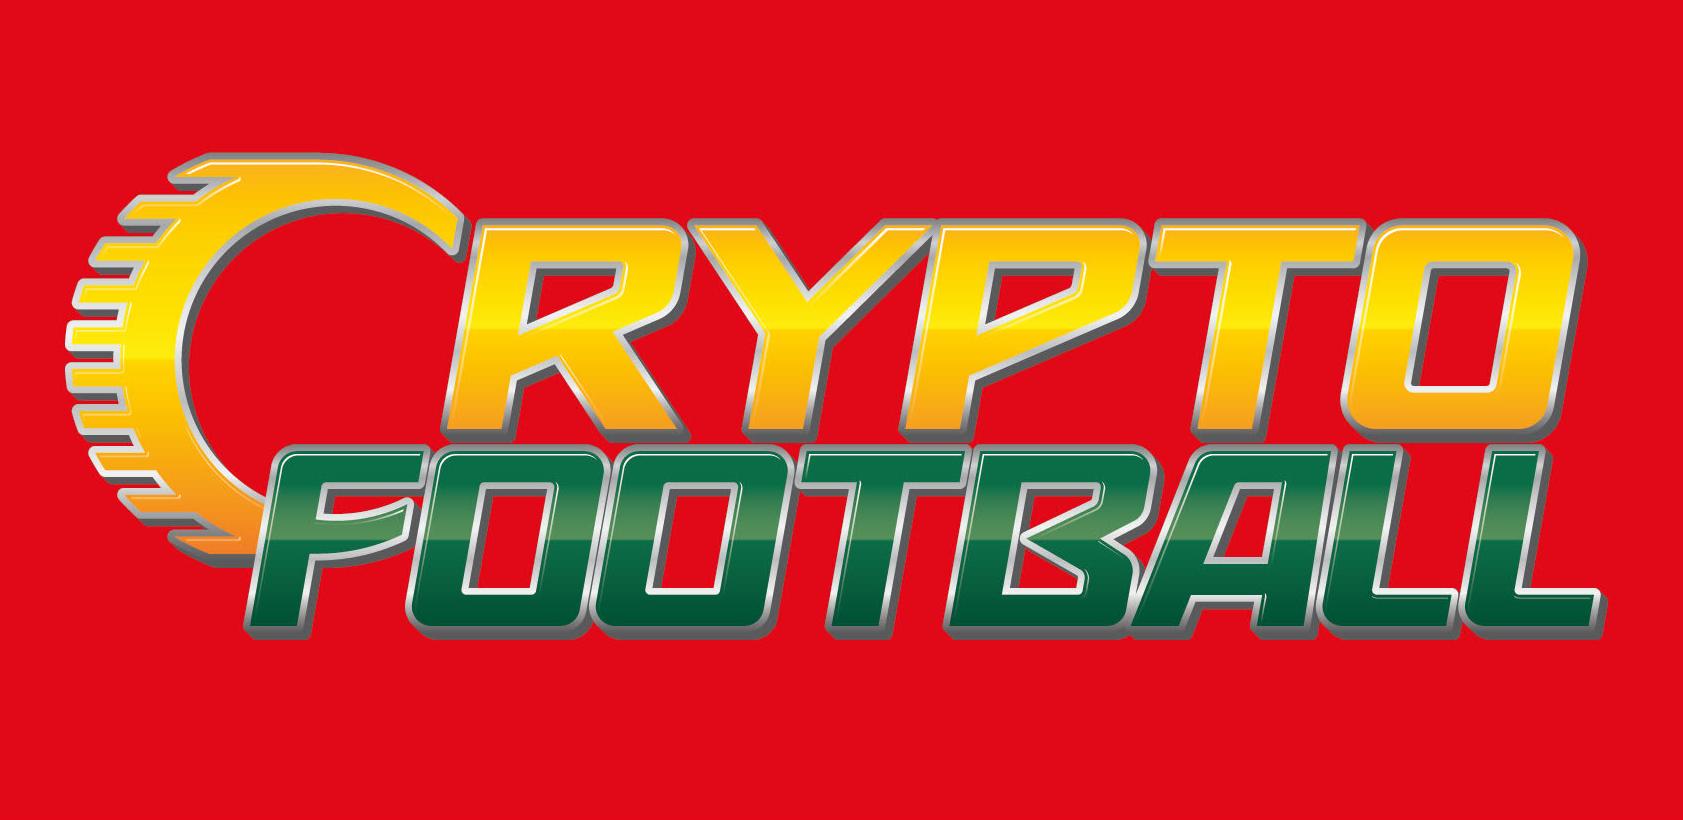 <Cryptofootball.world